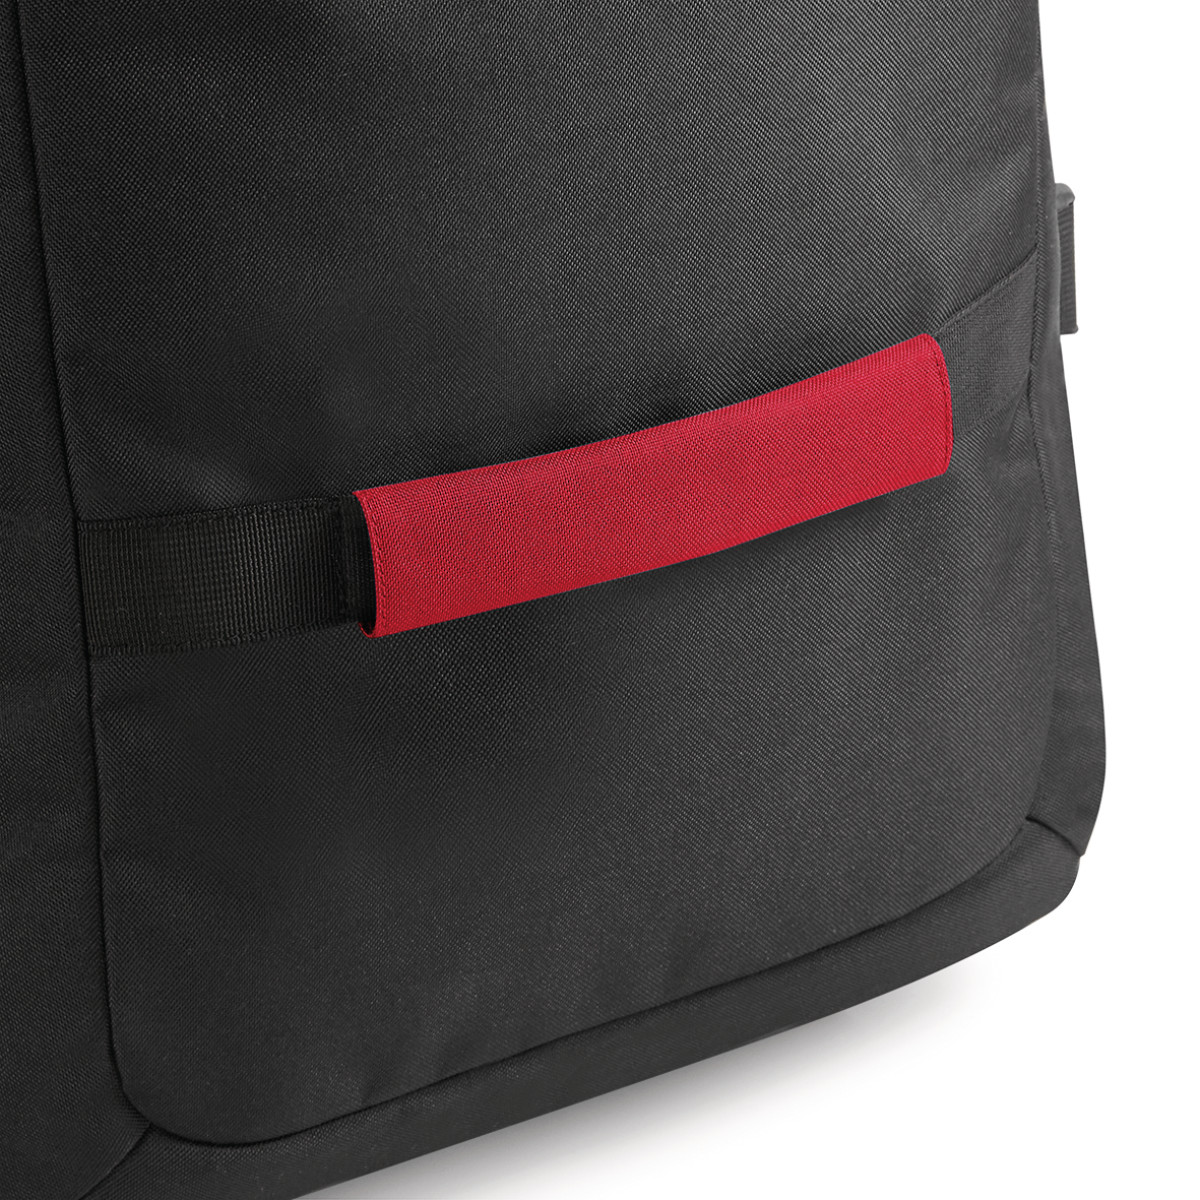 Bagbase Escape Handle Wrap